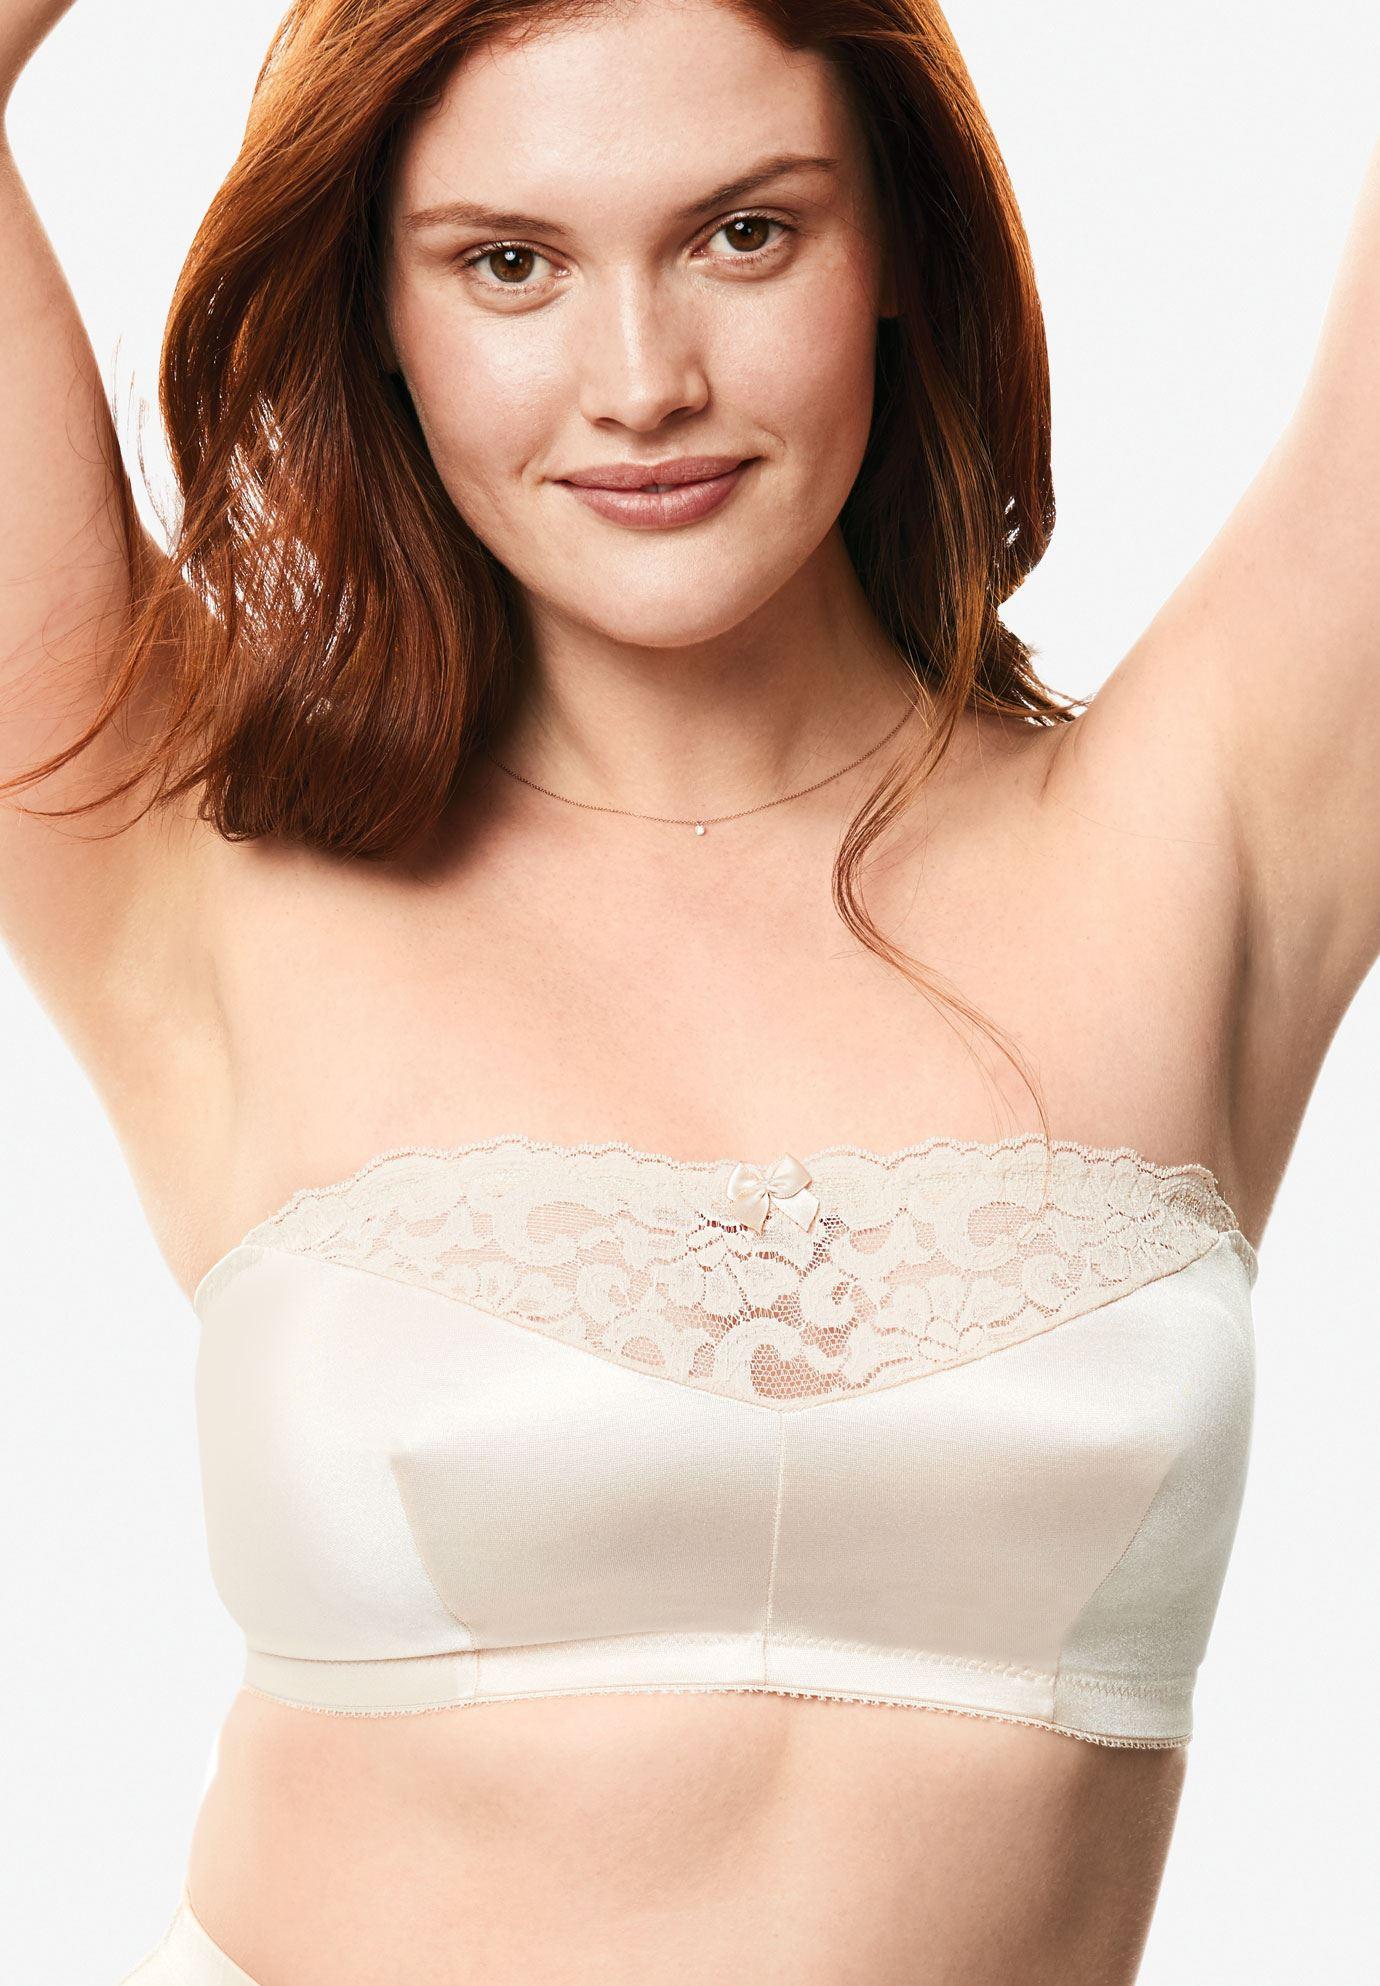 size Fuller beauty bigger site breast